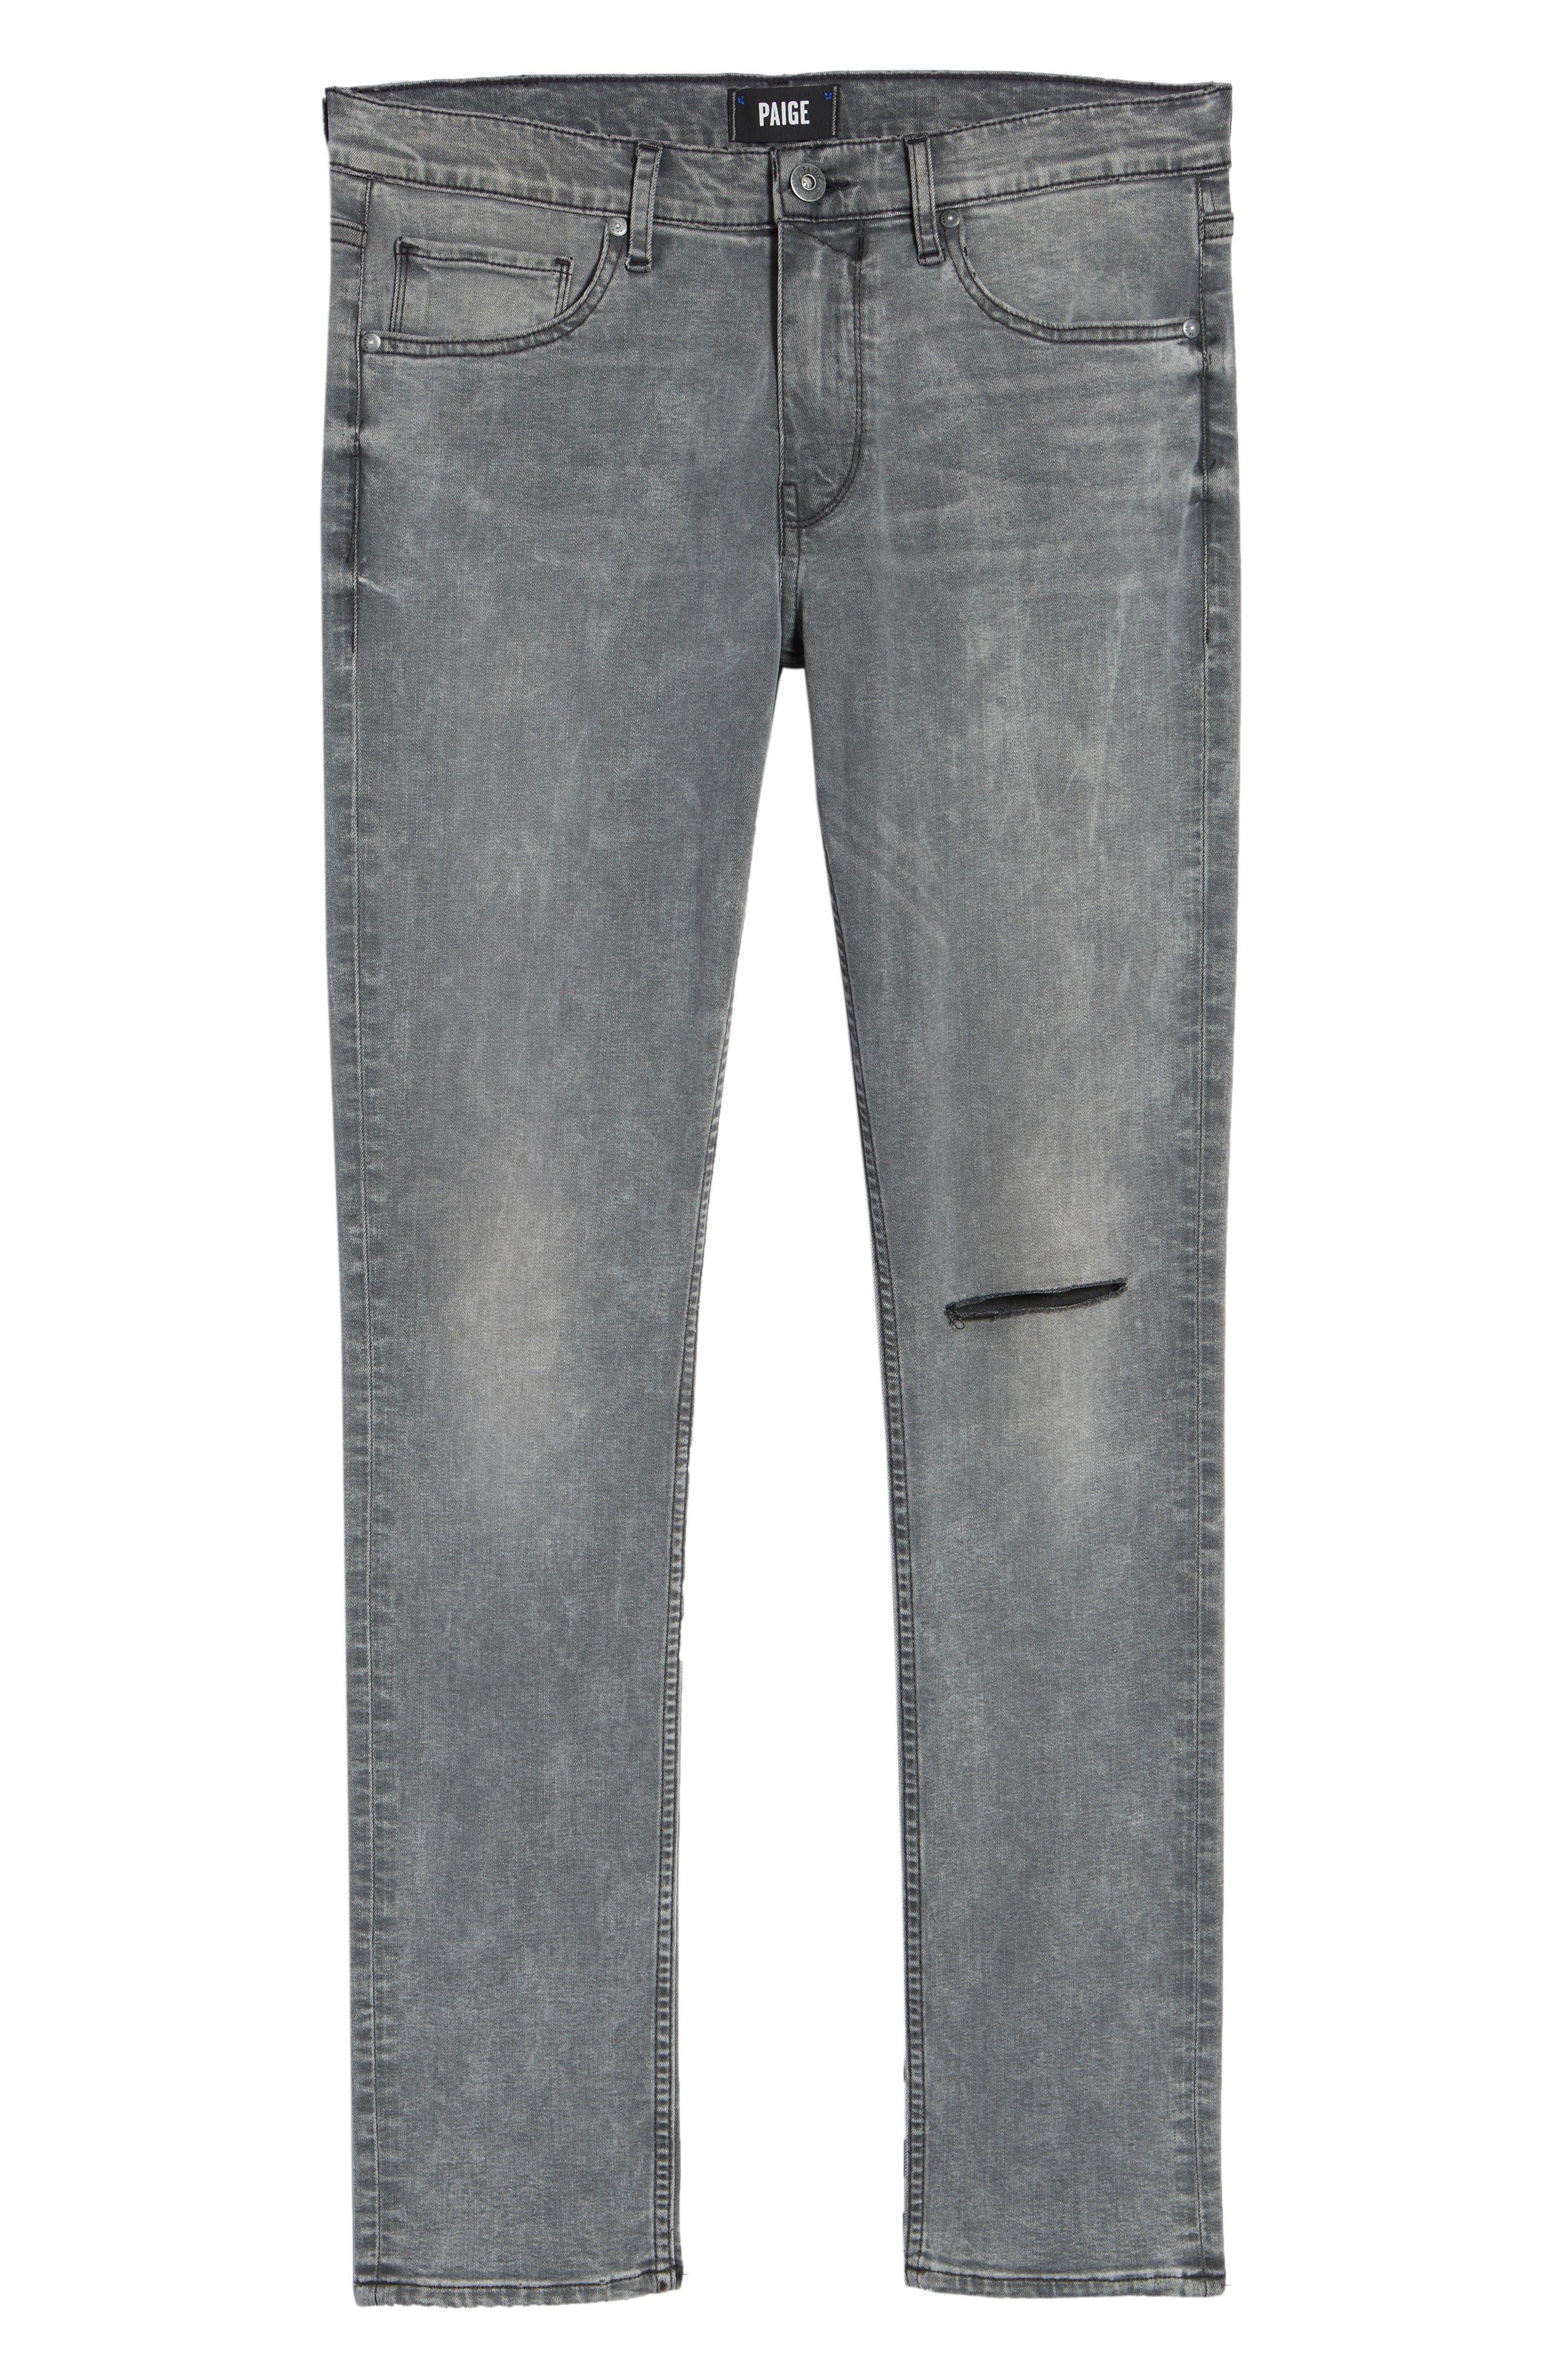 Lennox Slim Fit Jeans,                             Alternate thumbnail 6, color,                             020